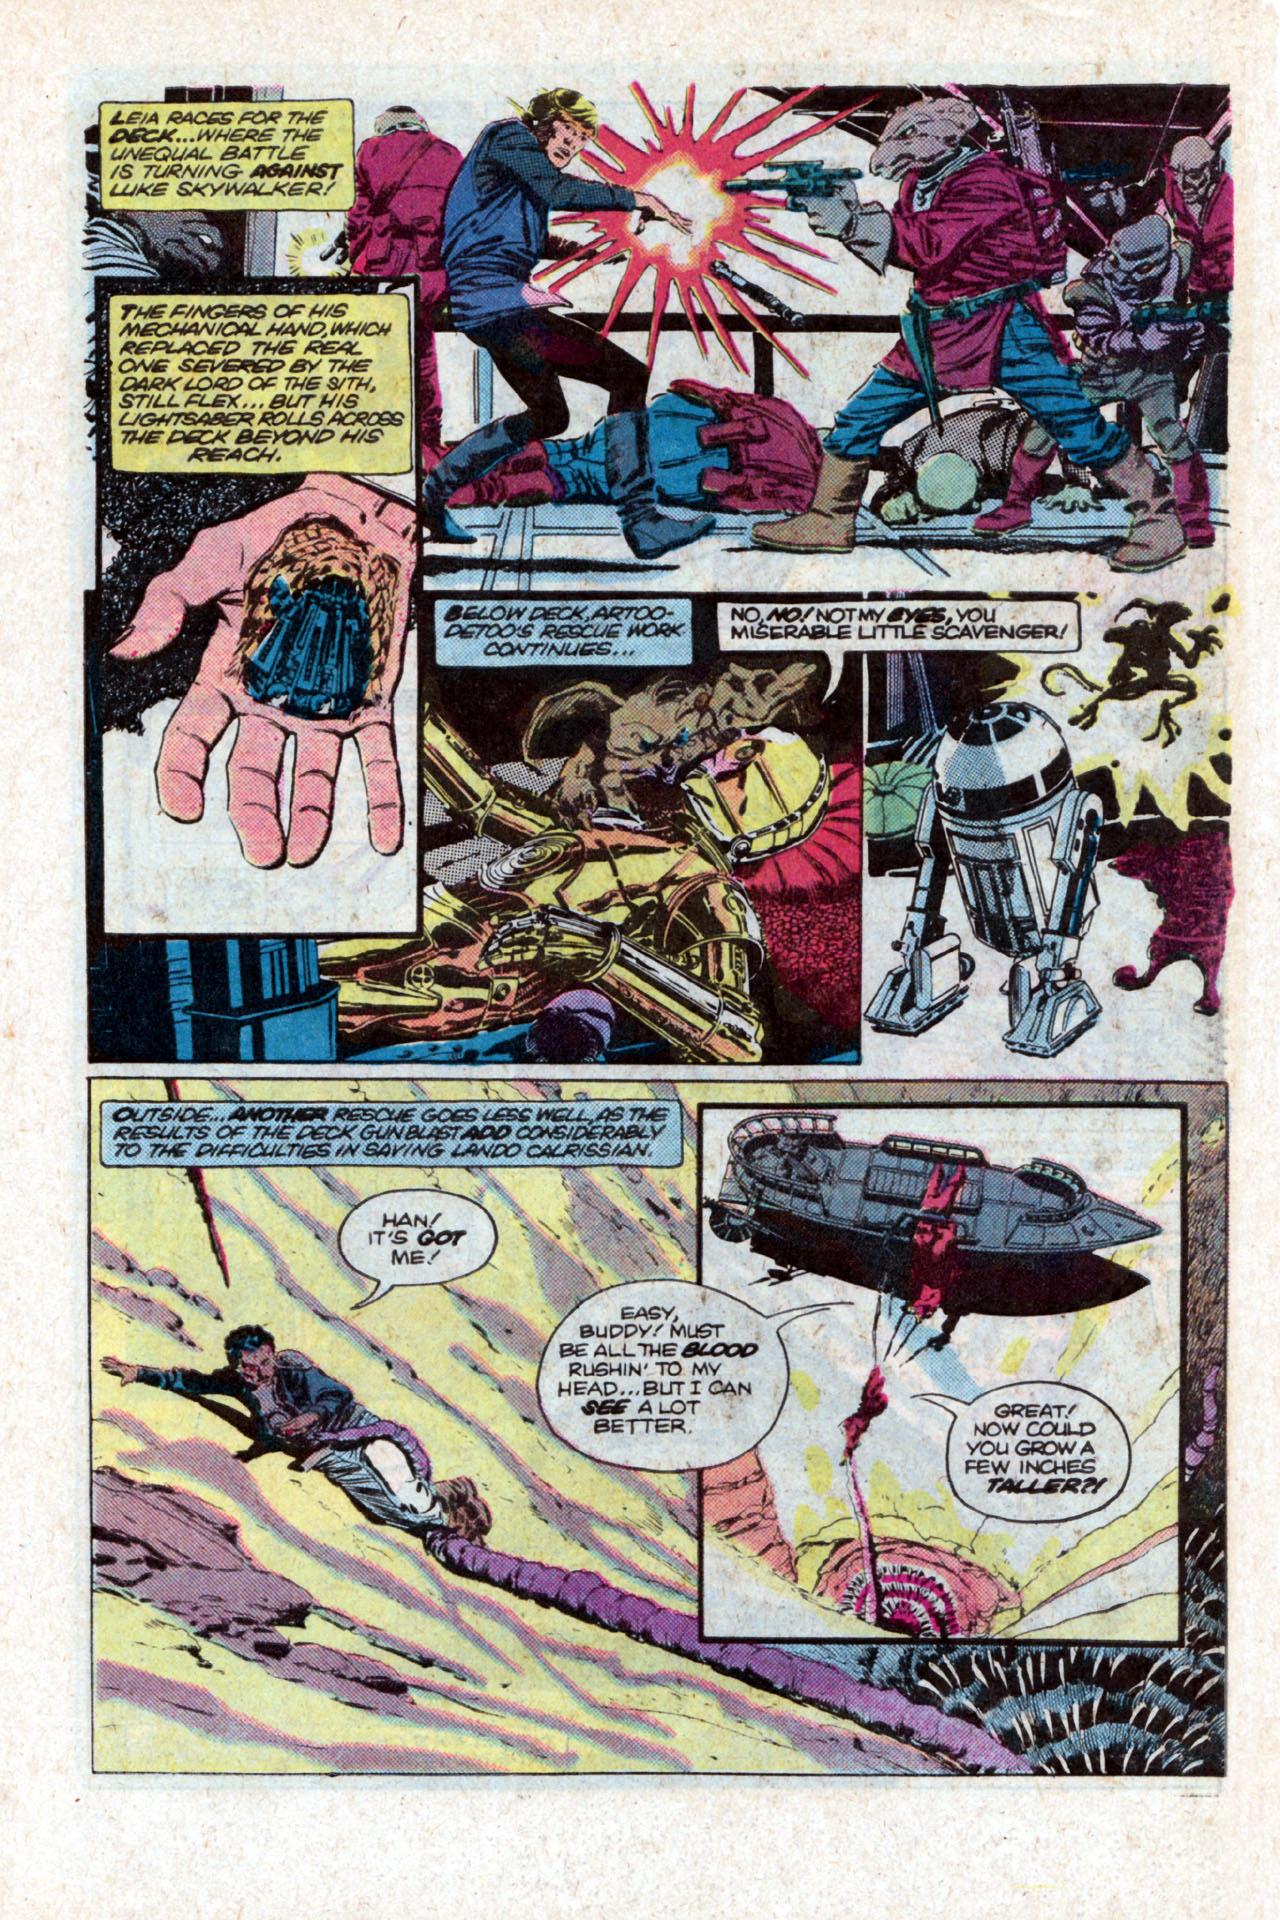 Read online Star Wars: Return of the Jedi comic -  Issue #2 - 11